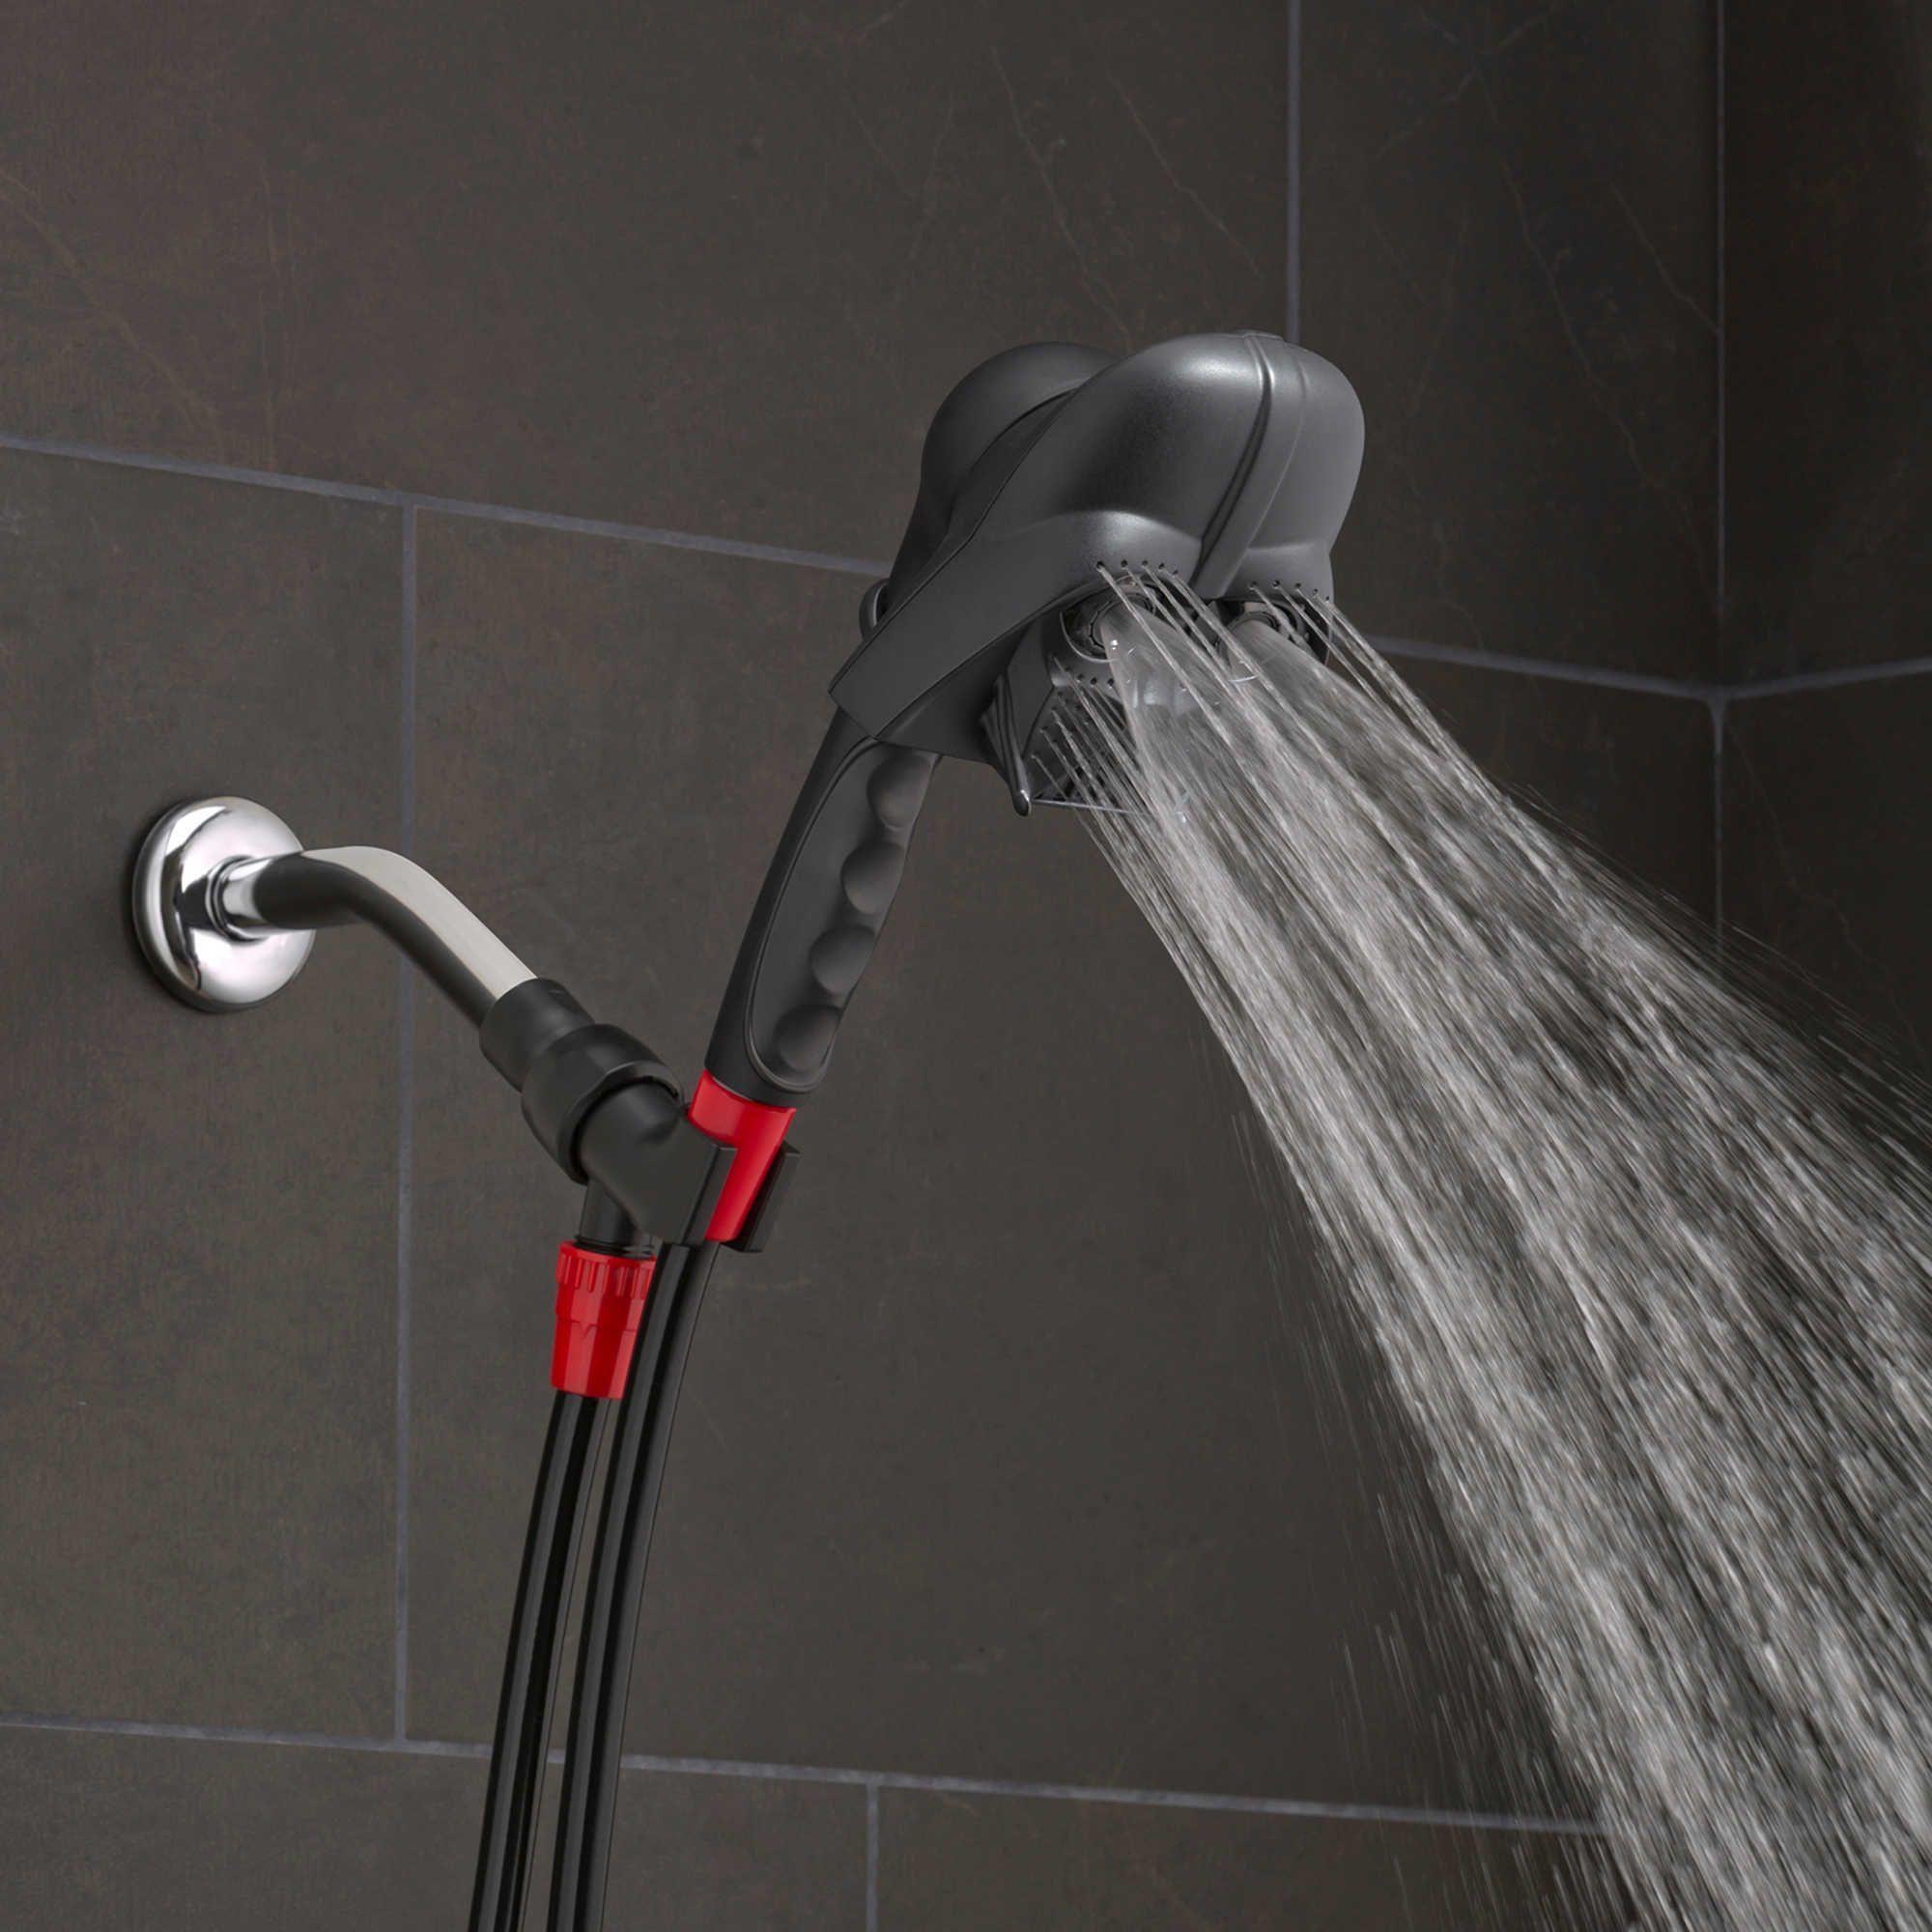 Oxygenics Darth Vader Shower Head